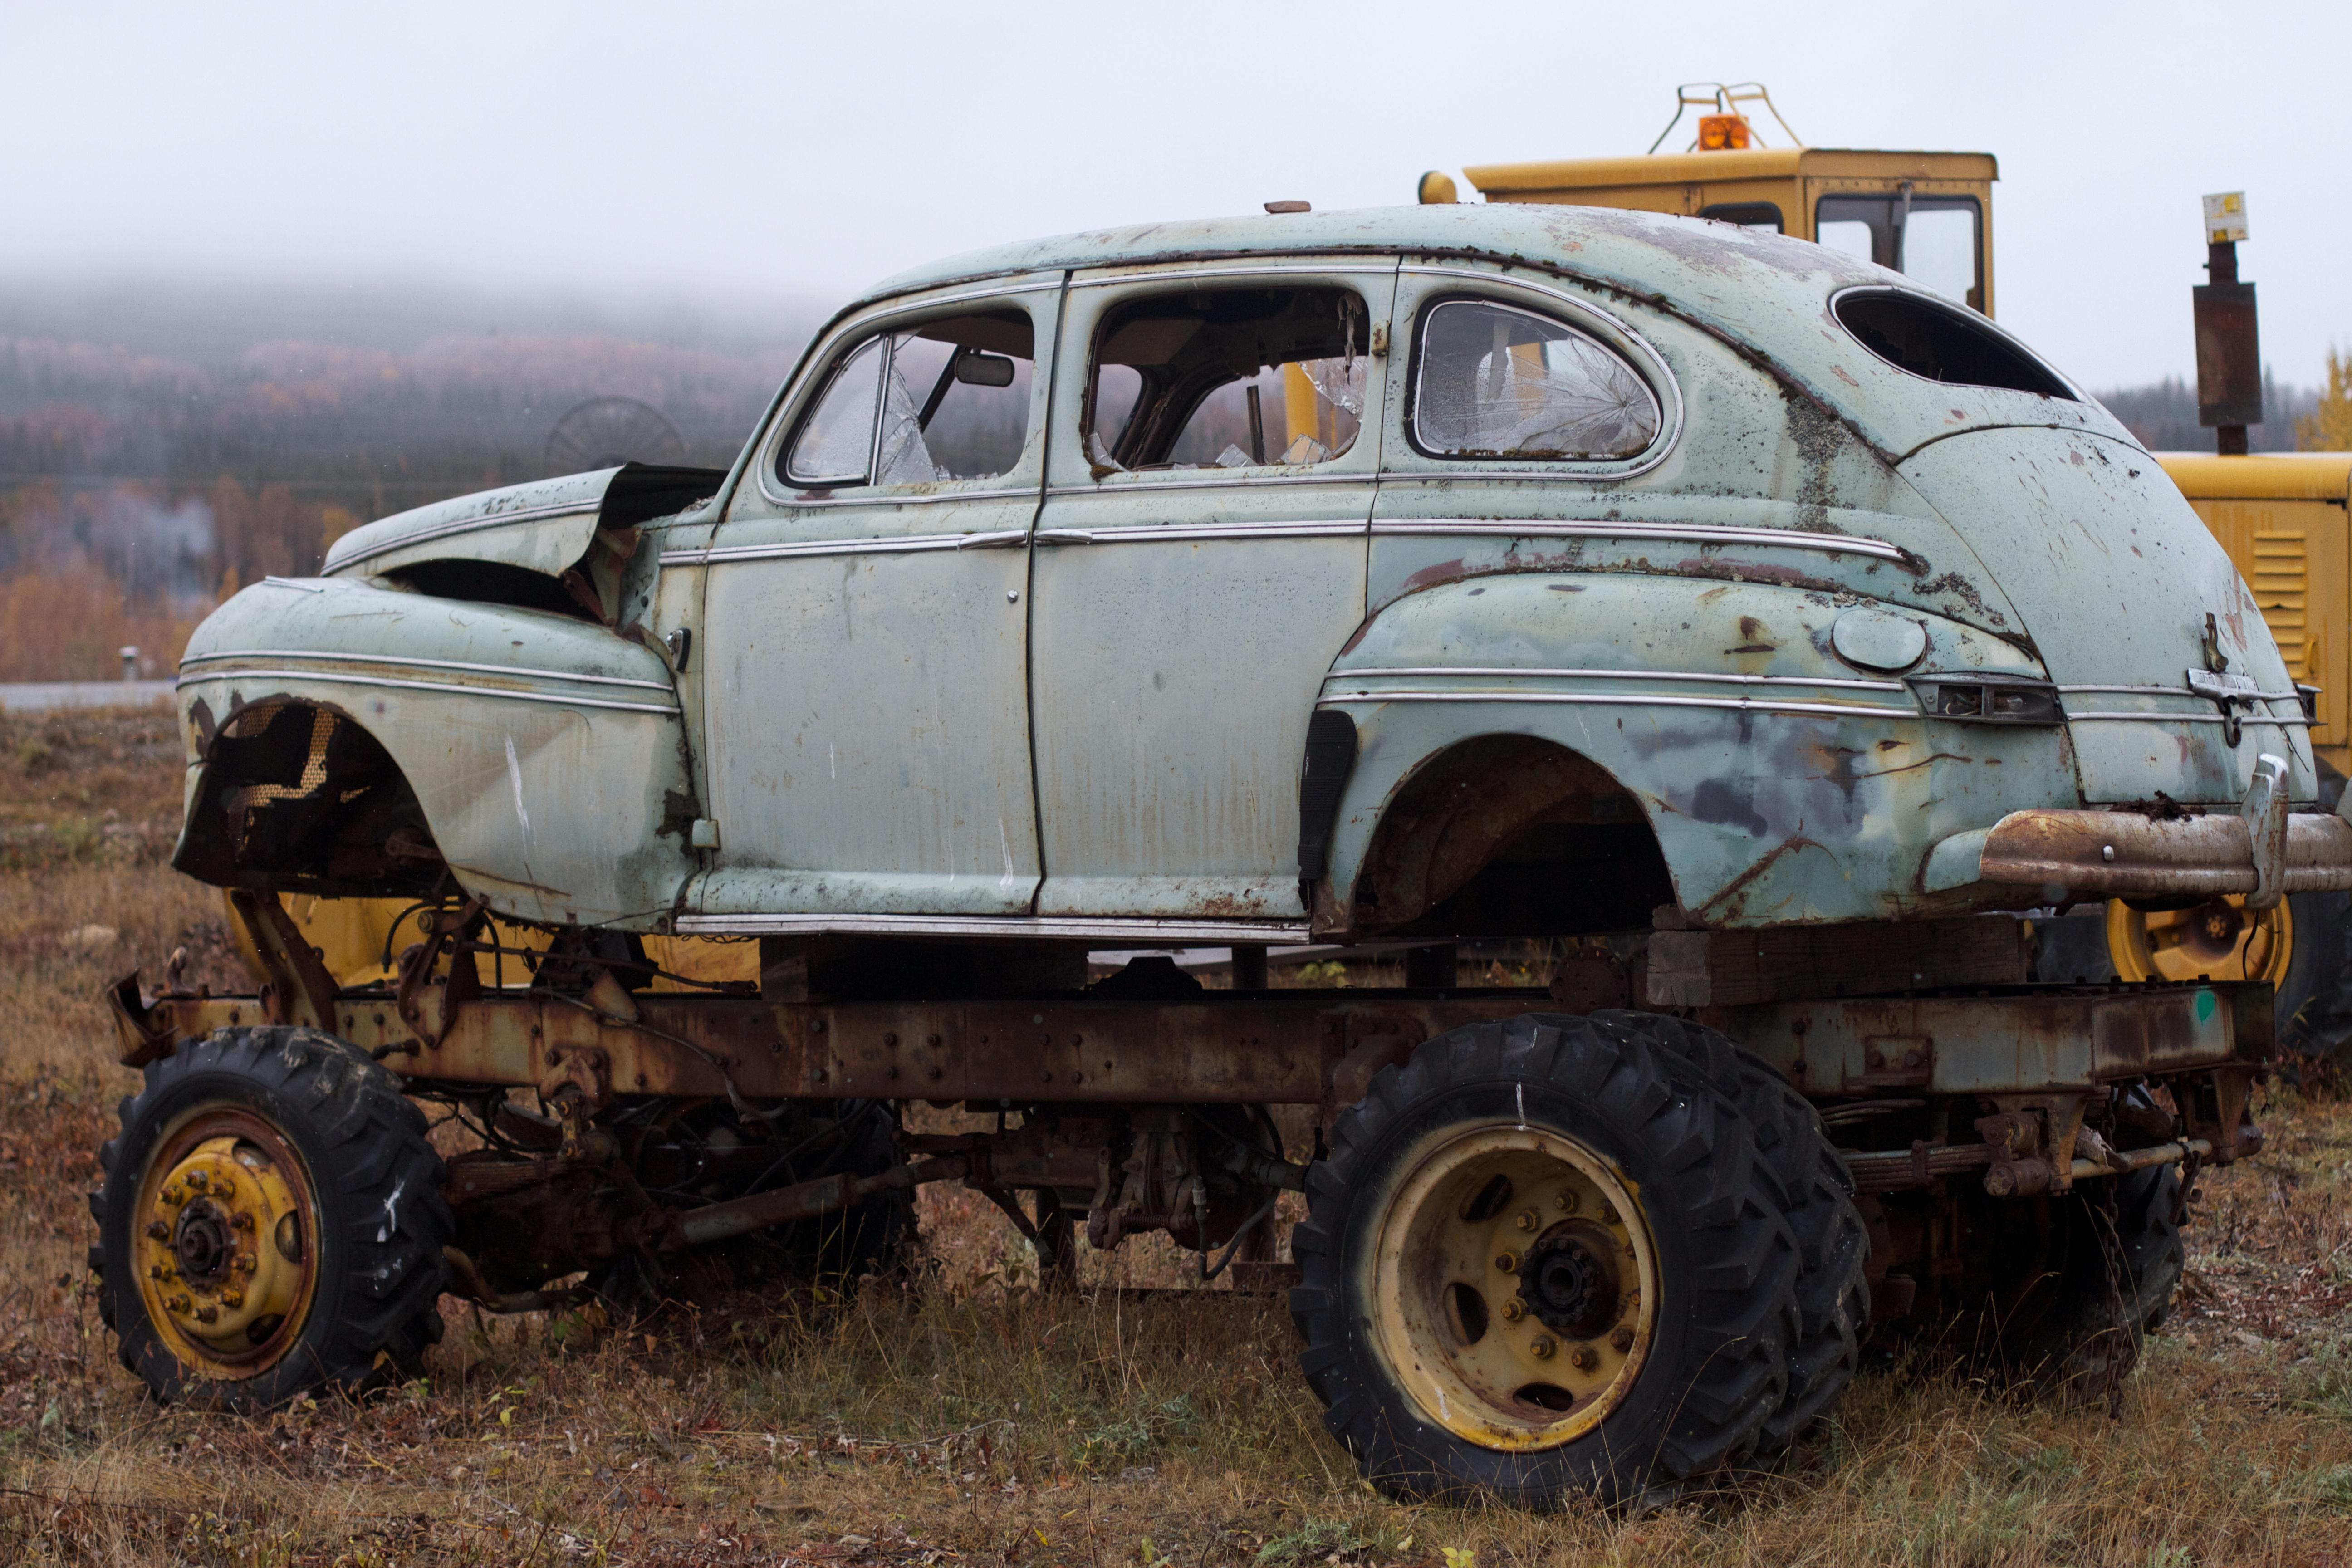 Gambar Truk Kendaraan Bermotor Mobil Antik Gambar Keren Off